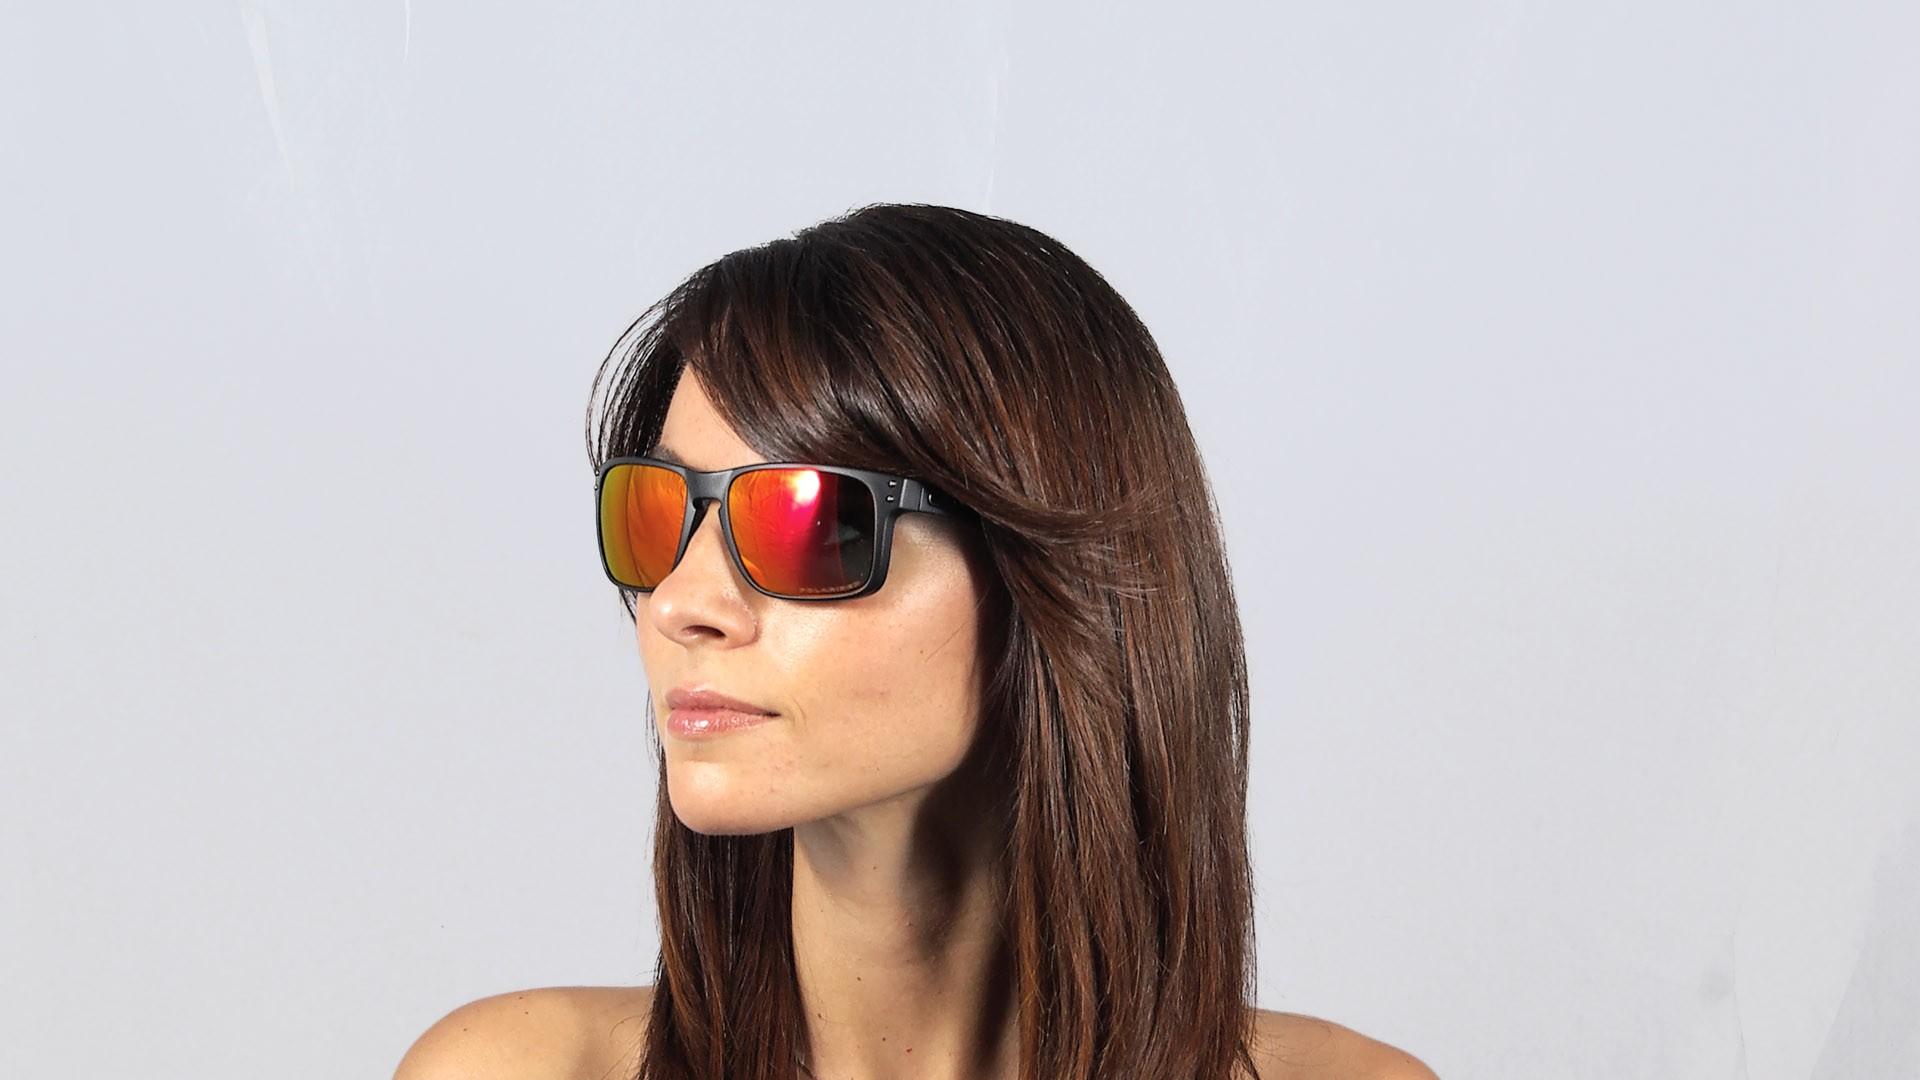 980e0f3528ed3 Sunglasses Oakley Holbrook Black Matte Iridium OO9102 51 55-18 Medium  Polarized Mirror